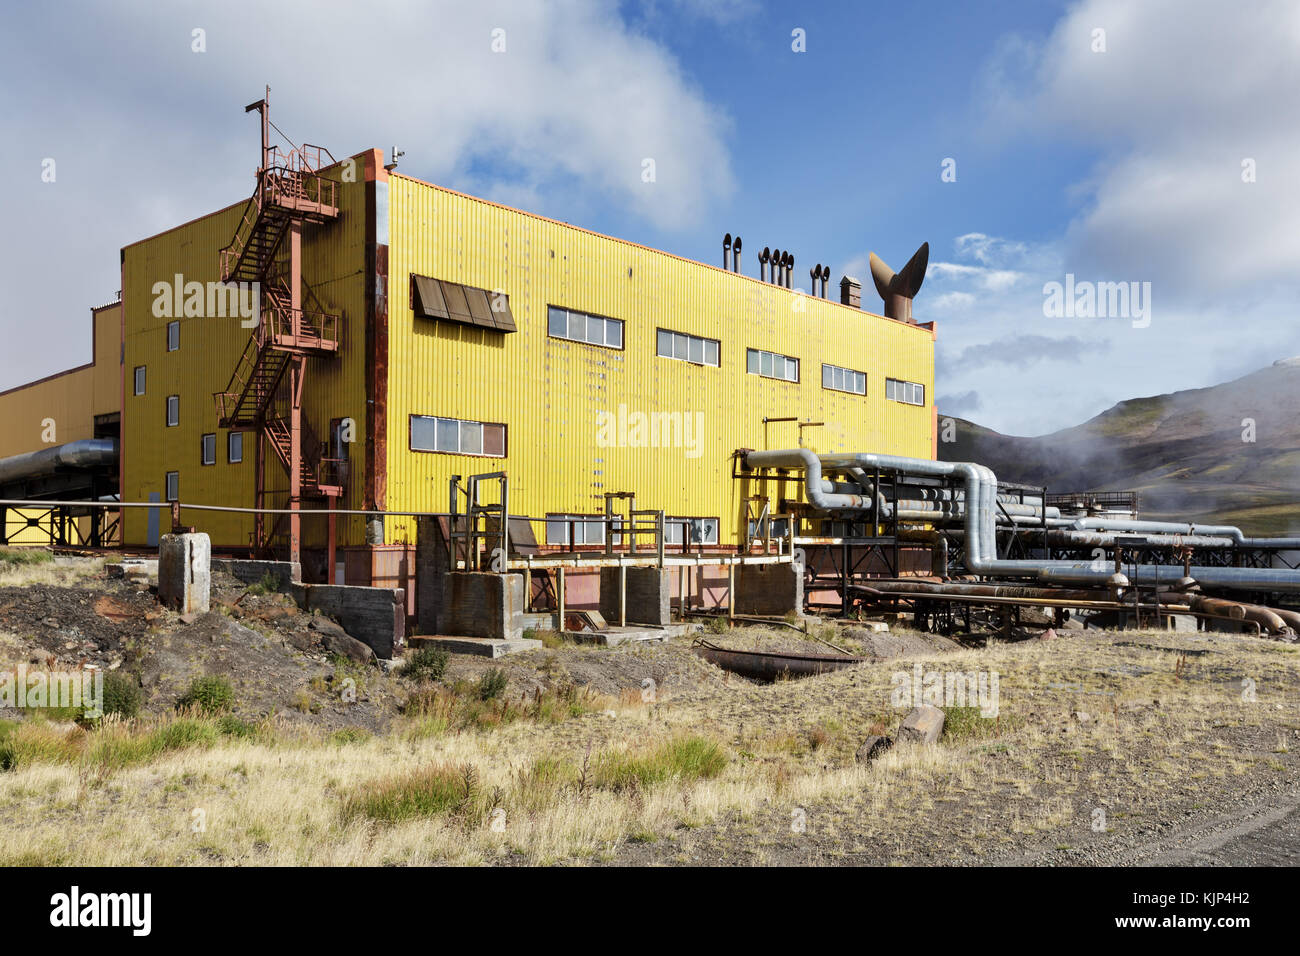 Station de pompage et du séparateur de mutnovskaya geothermal power station (geopp mutnovskaya-1) utilisant Photo Stock